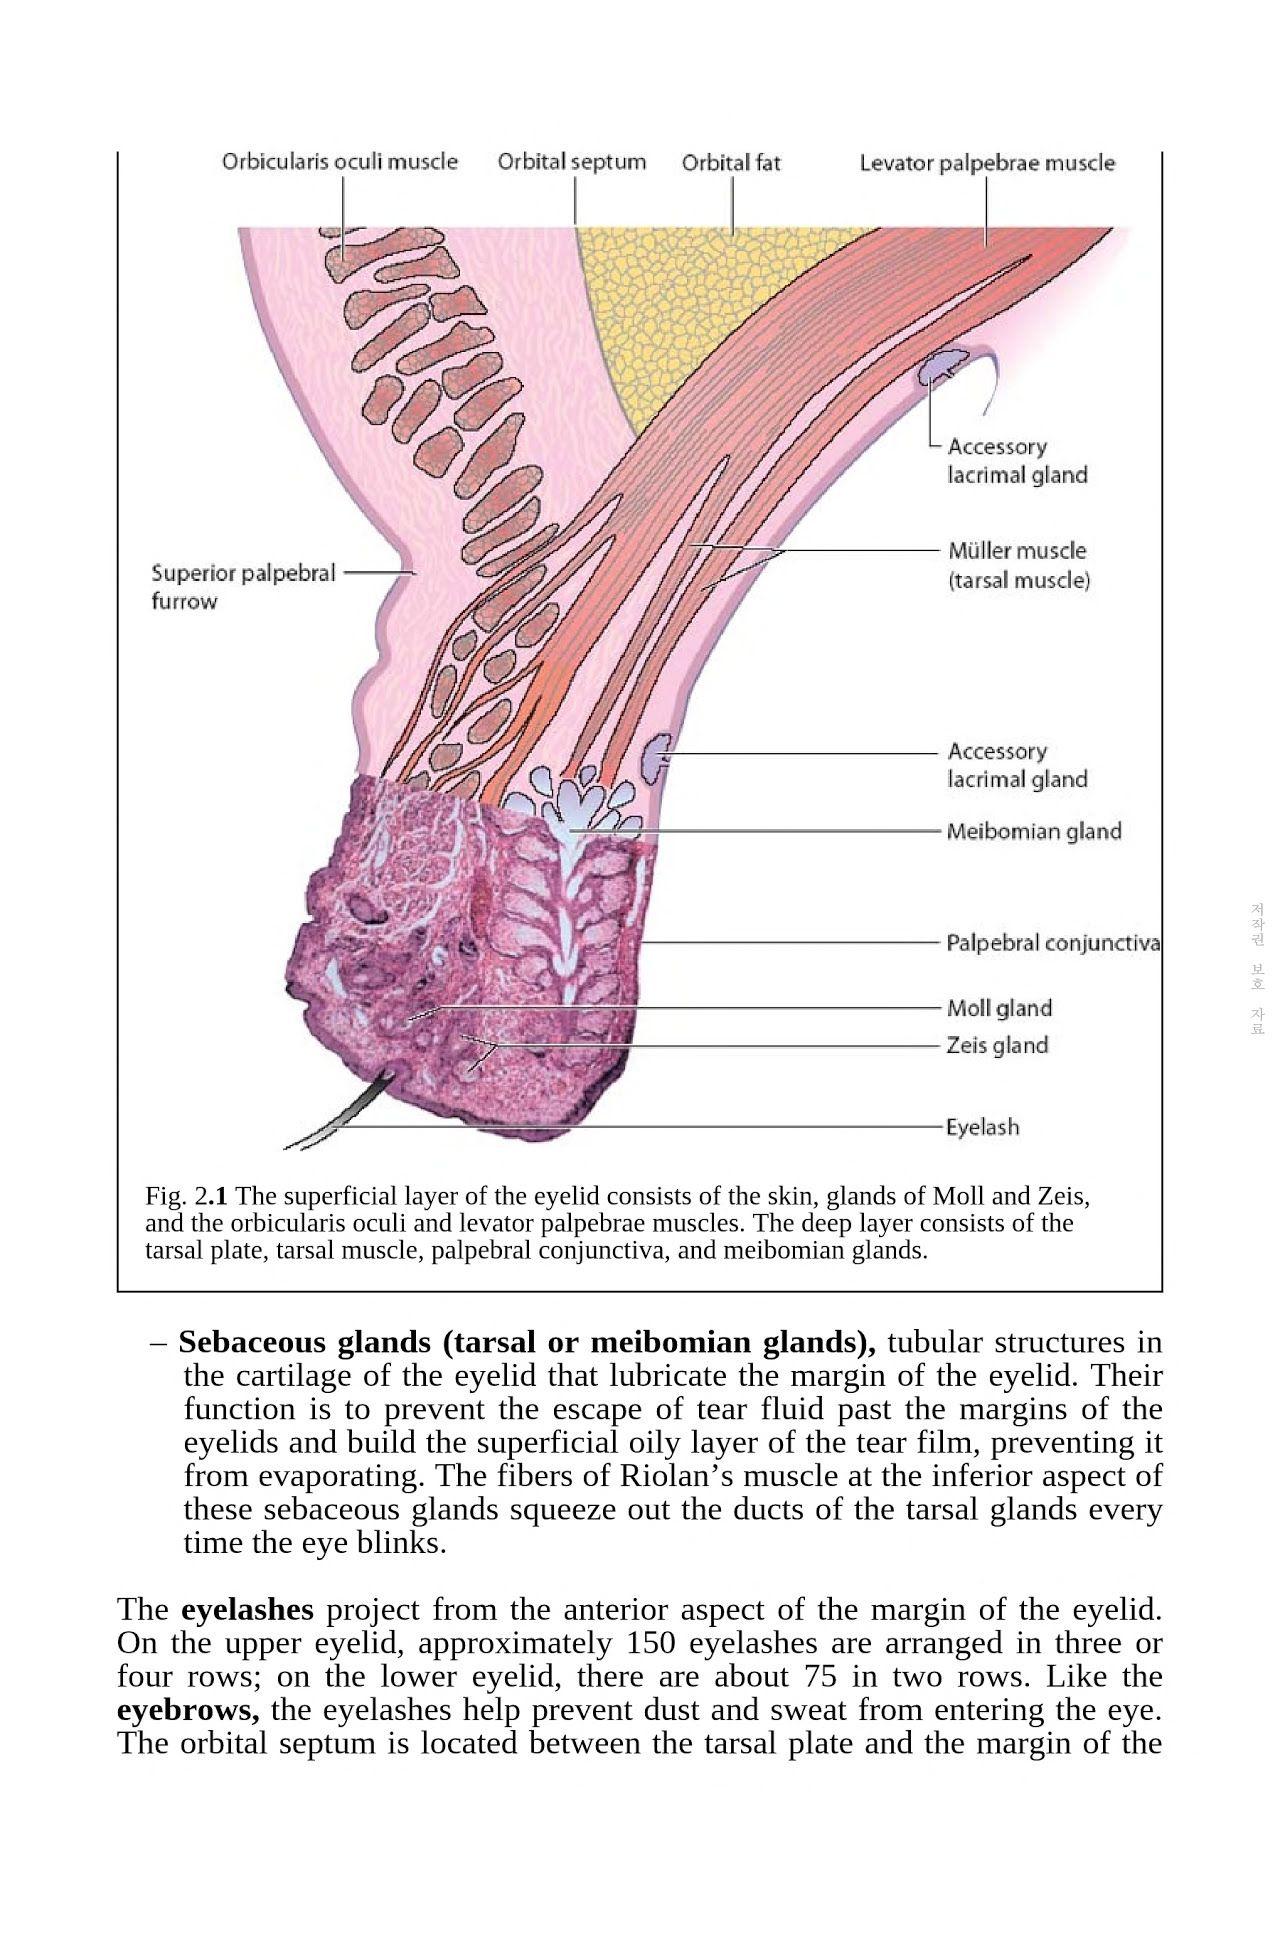 Ophthalmology | Ophthalmology | Pinterest | Books